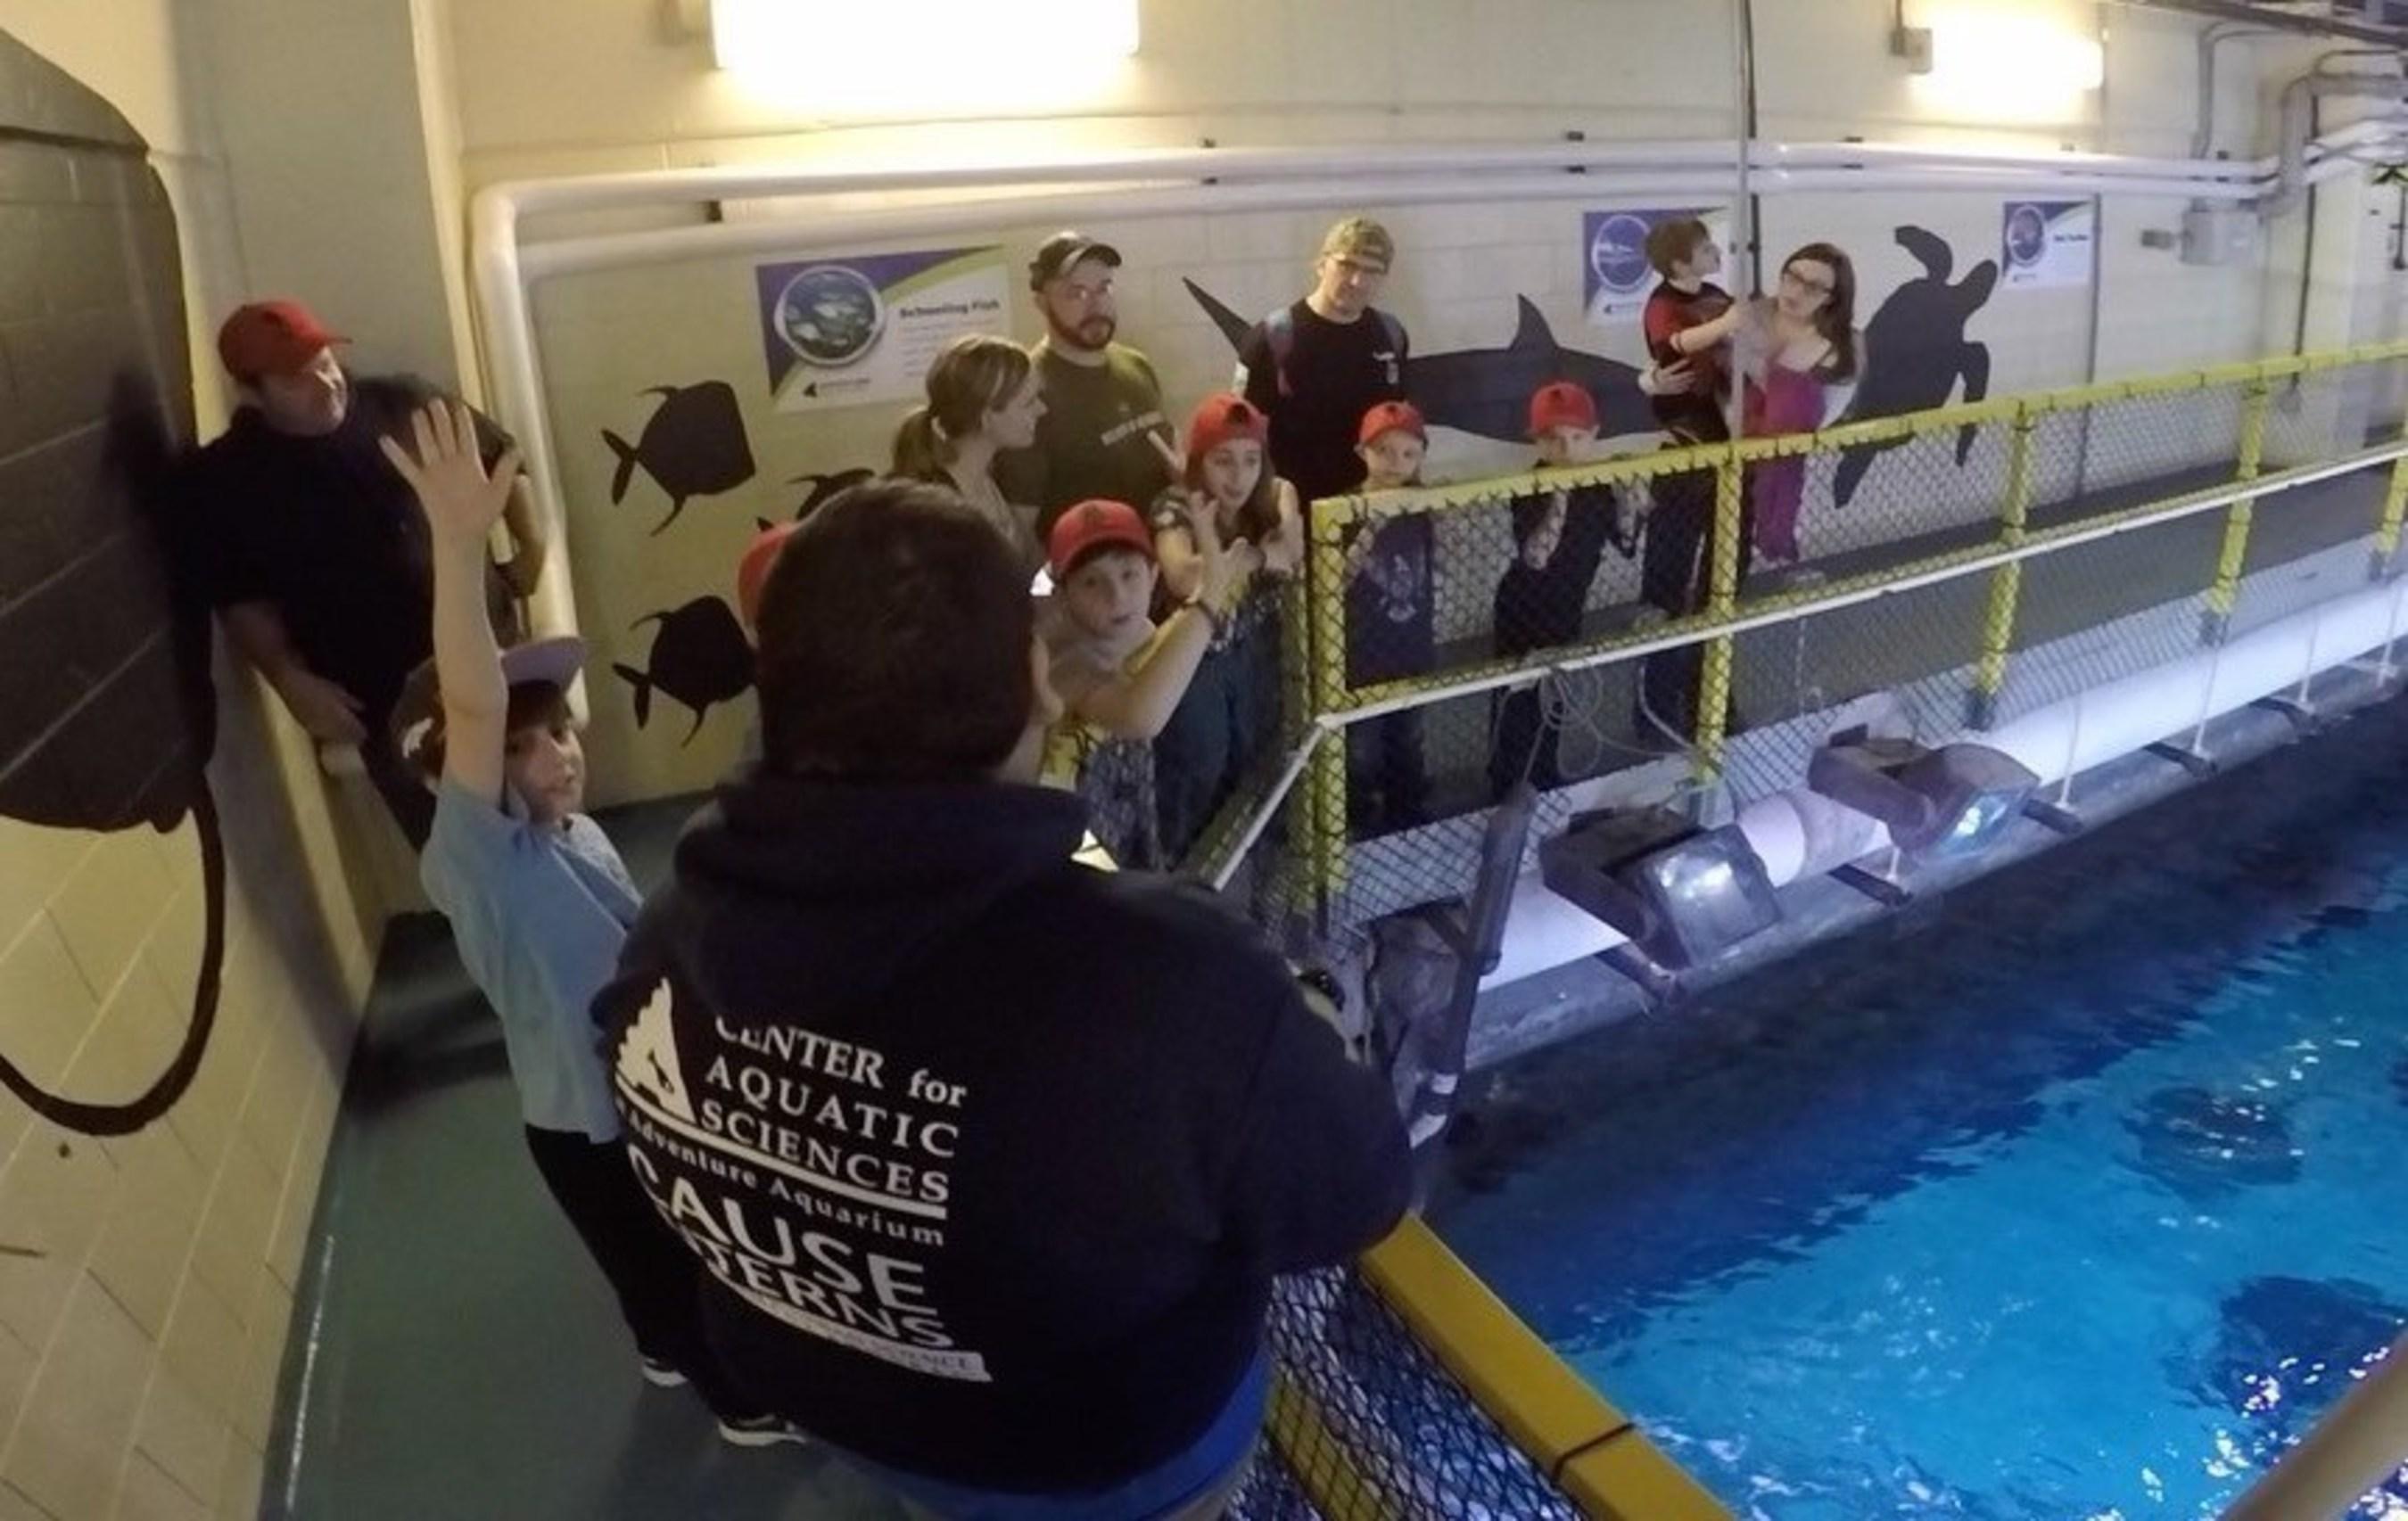 Families of injured service members tour behind the tanks at Adventure Aquarium.